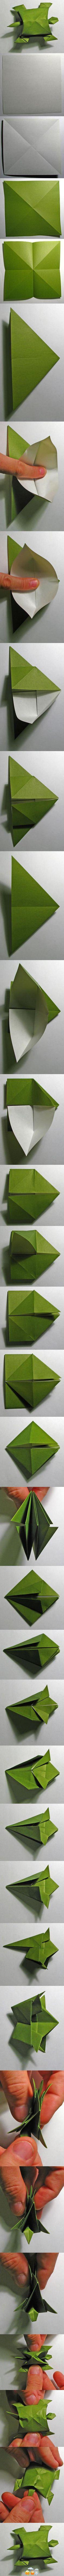 best origami images on Pinterest Modular origami Origami